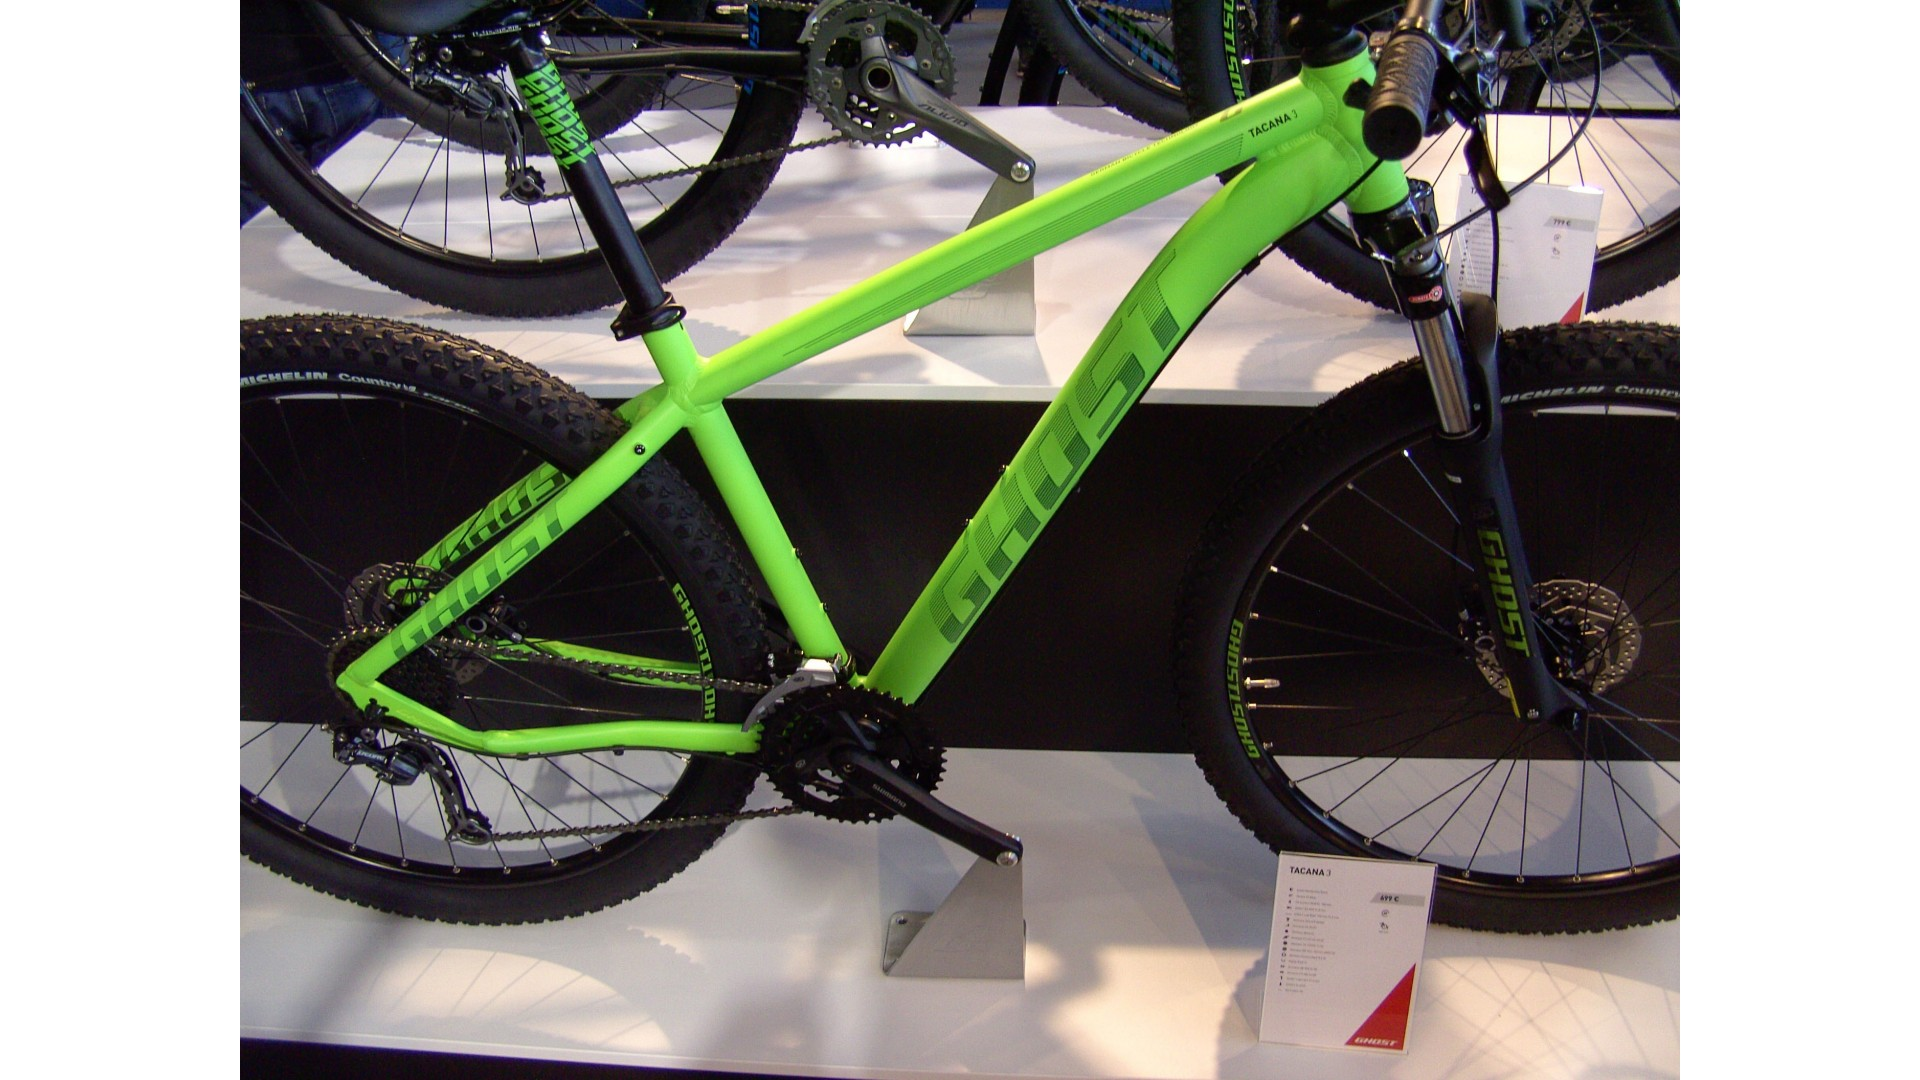 Велосипед GHOST Tacana 3 green/darkgreen/black евробайк год 2016